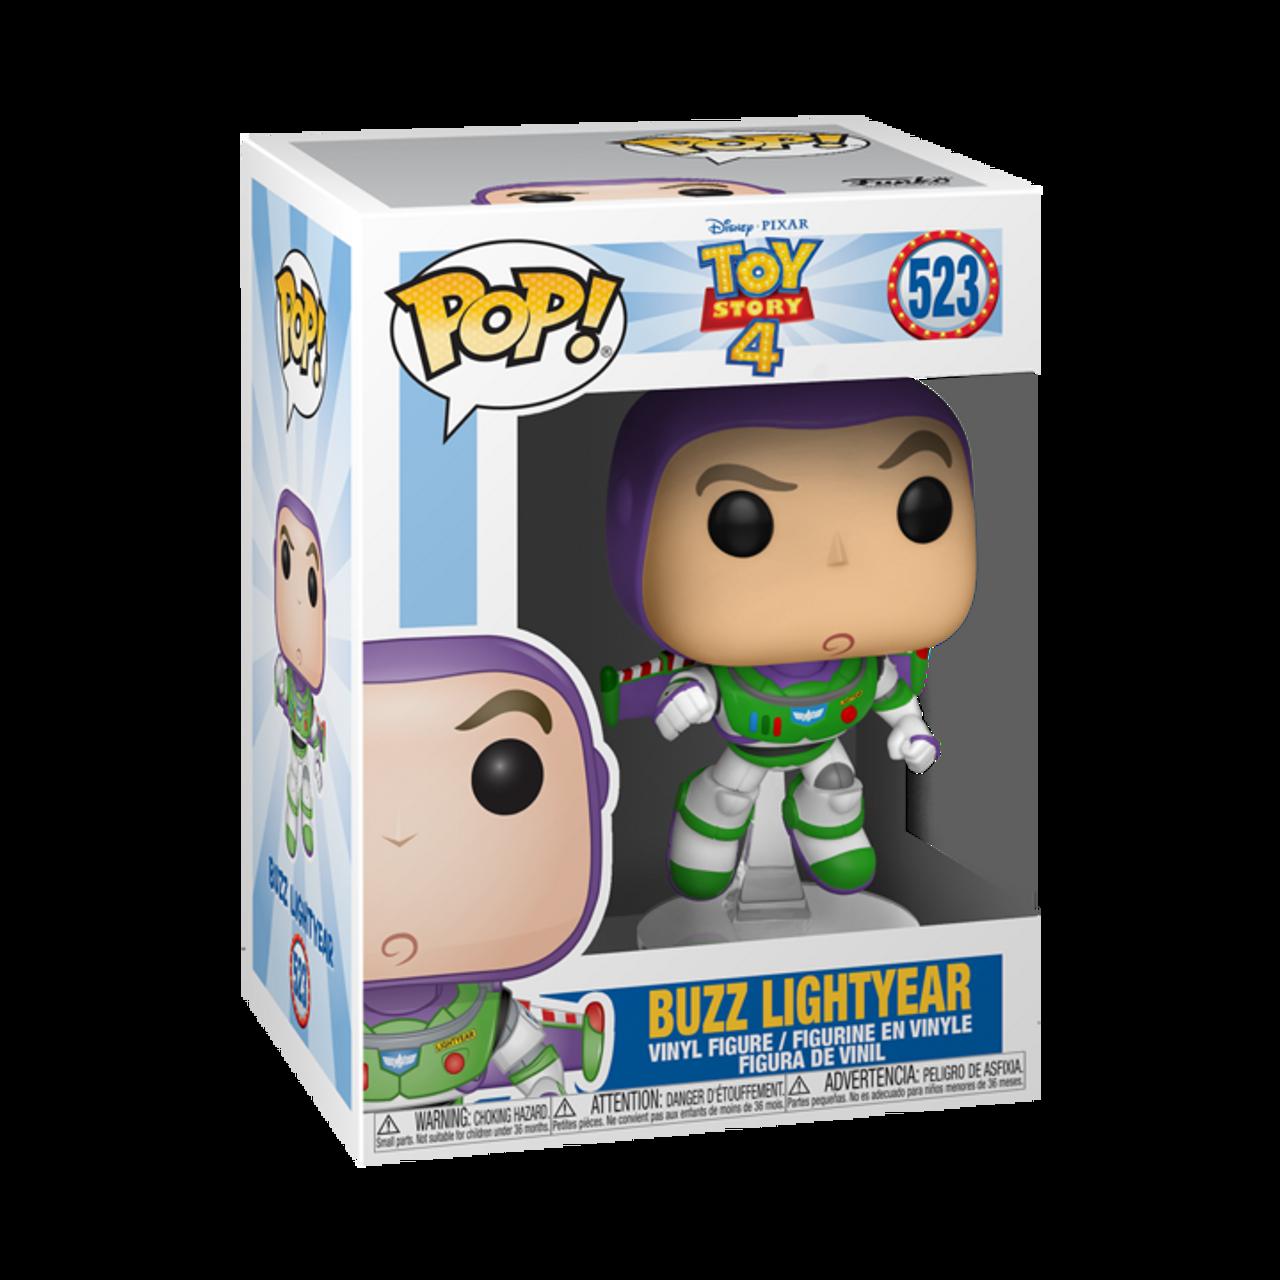 Toy Story 4 Buzz Lightyear Pop Vinyl Figure Buy At Not Just Toyz